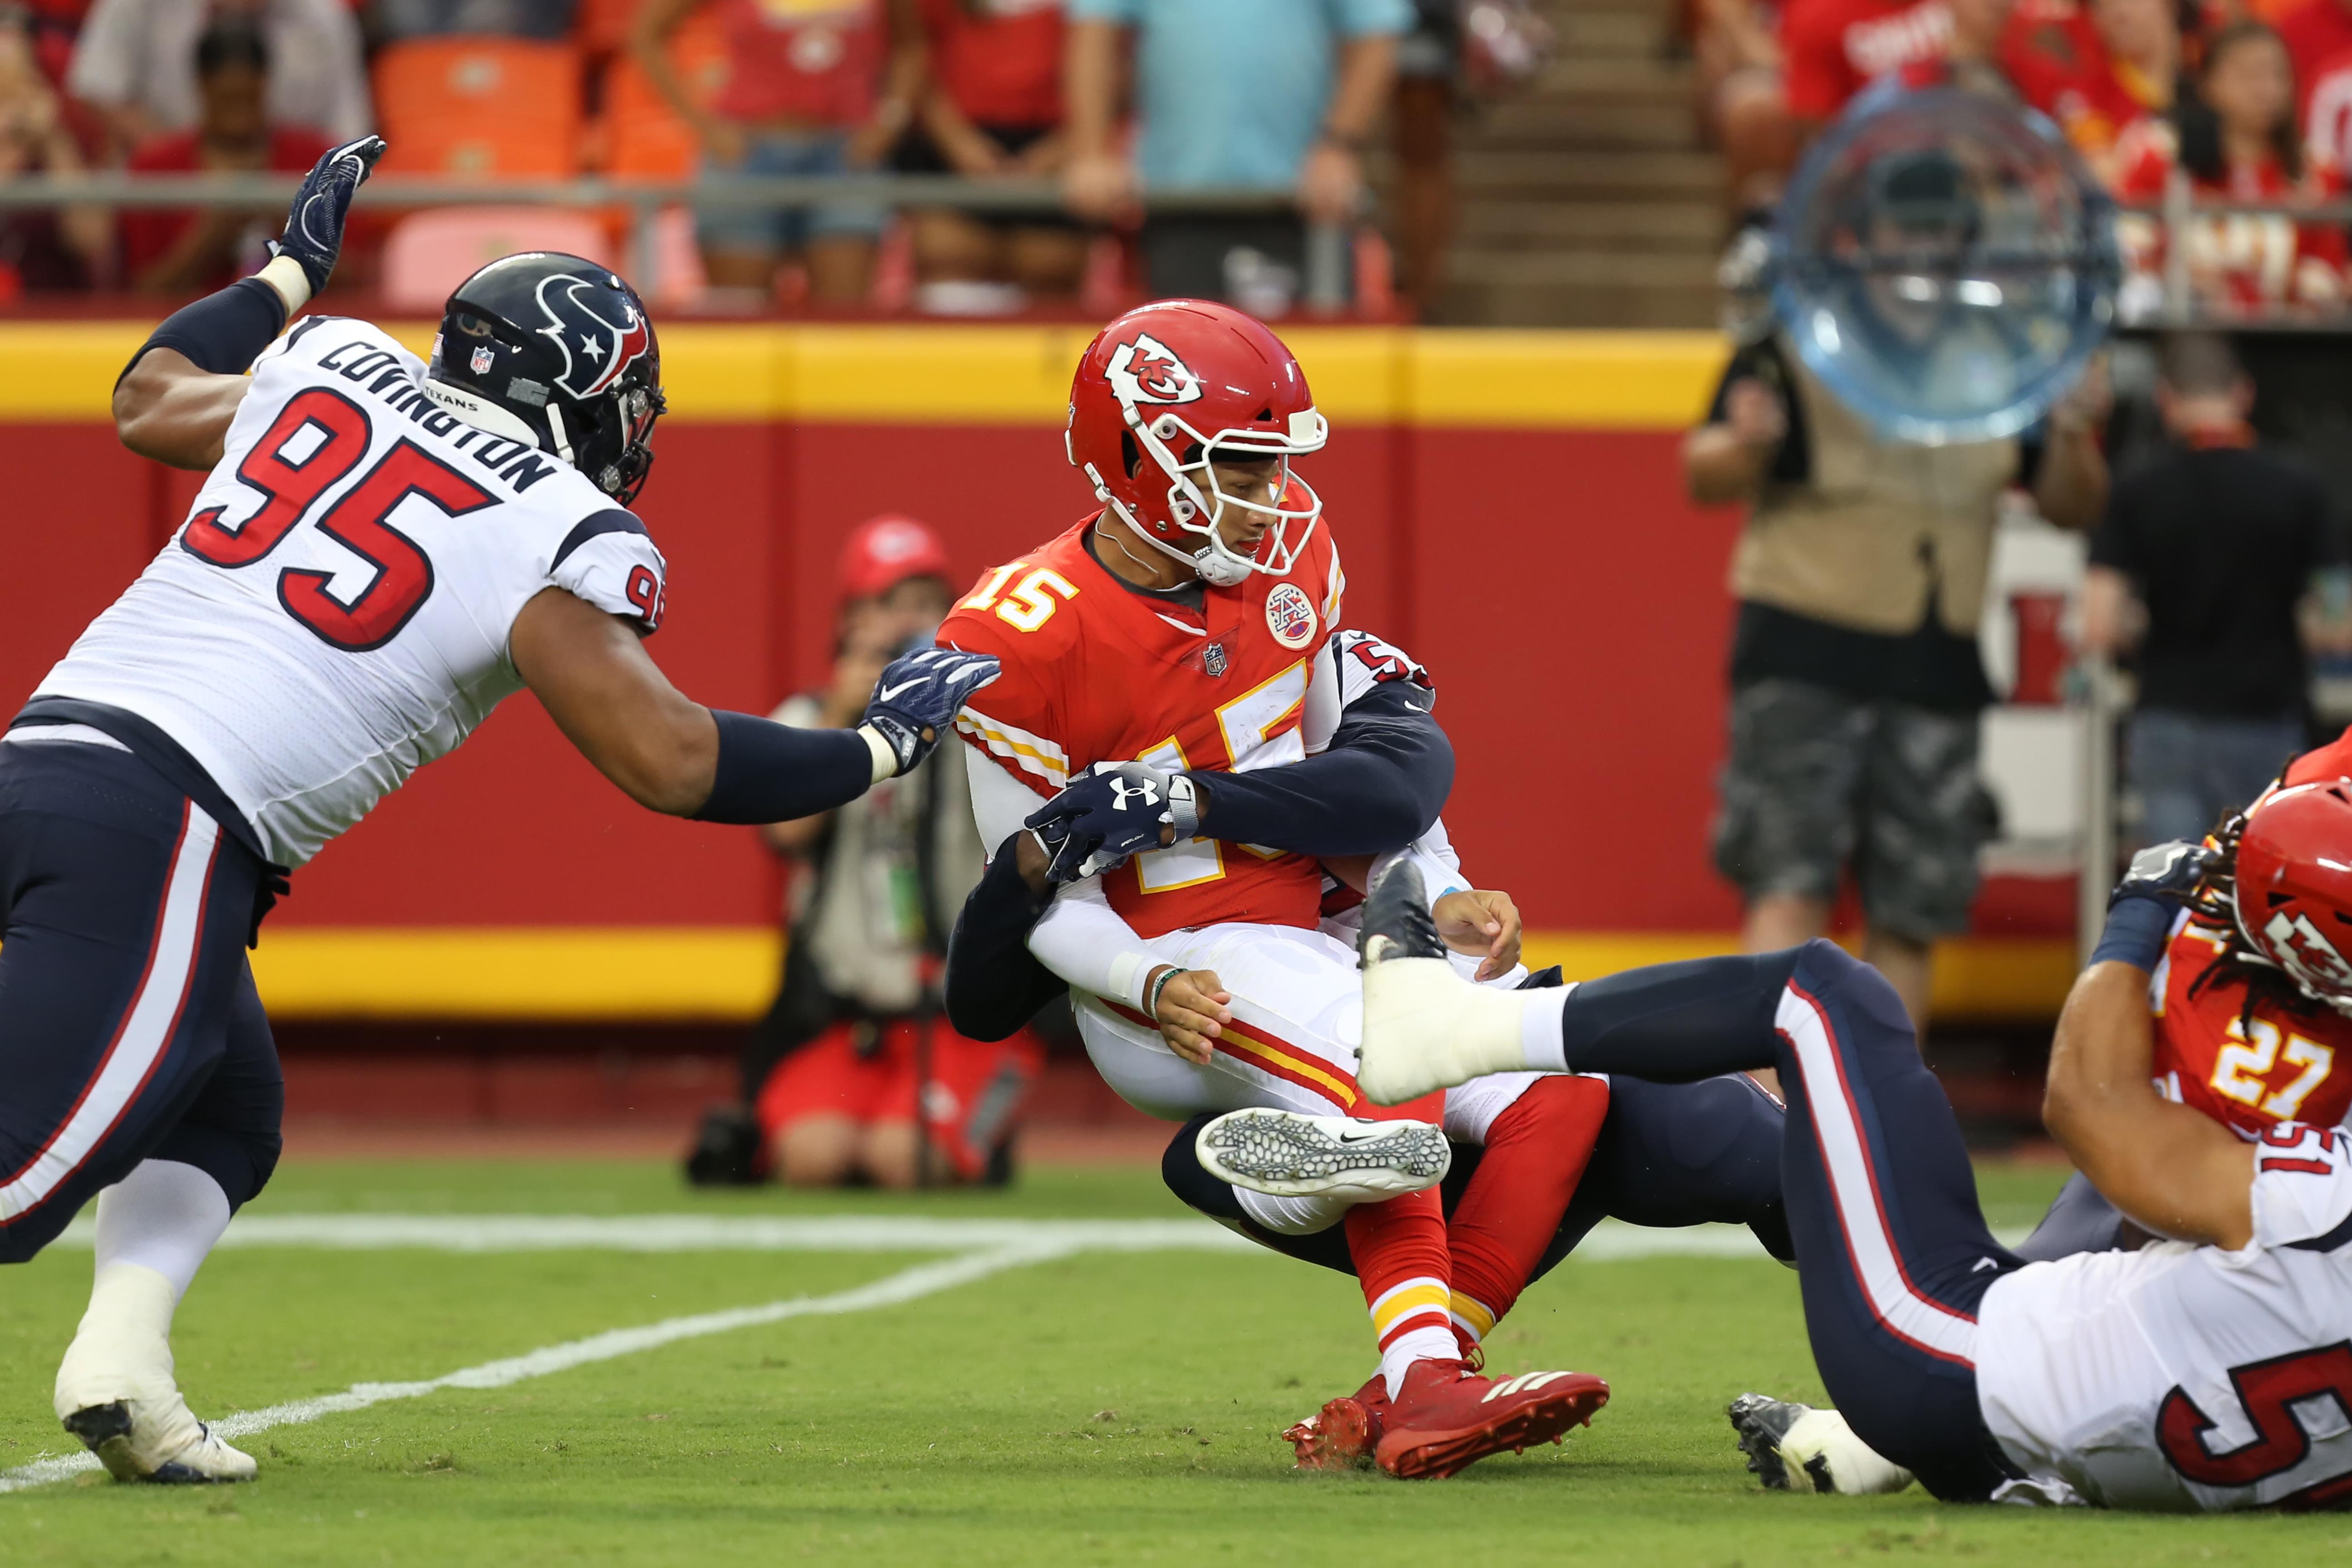 NFL: AUG 09 Preseason - Texans at Chiefs